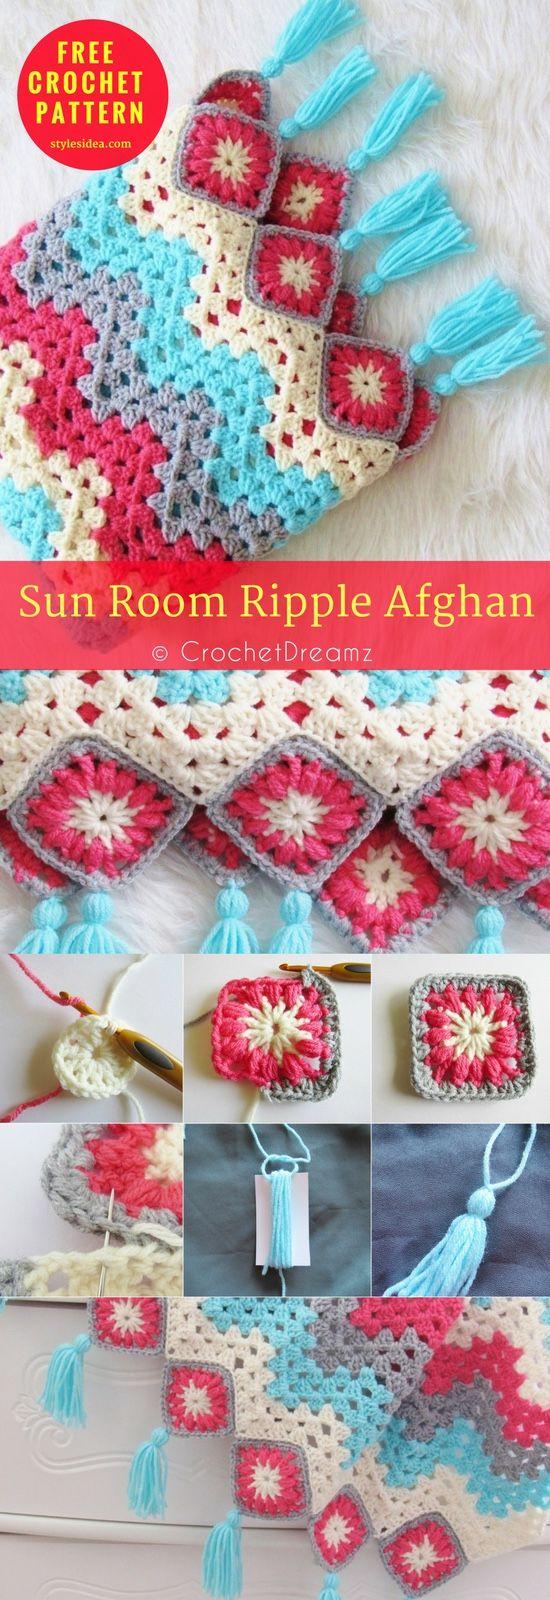 Sun Room Afghan Free Crochet Pattern | Kuschelecke, Häkeln und ...